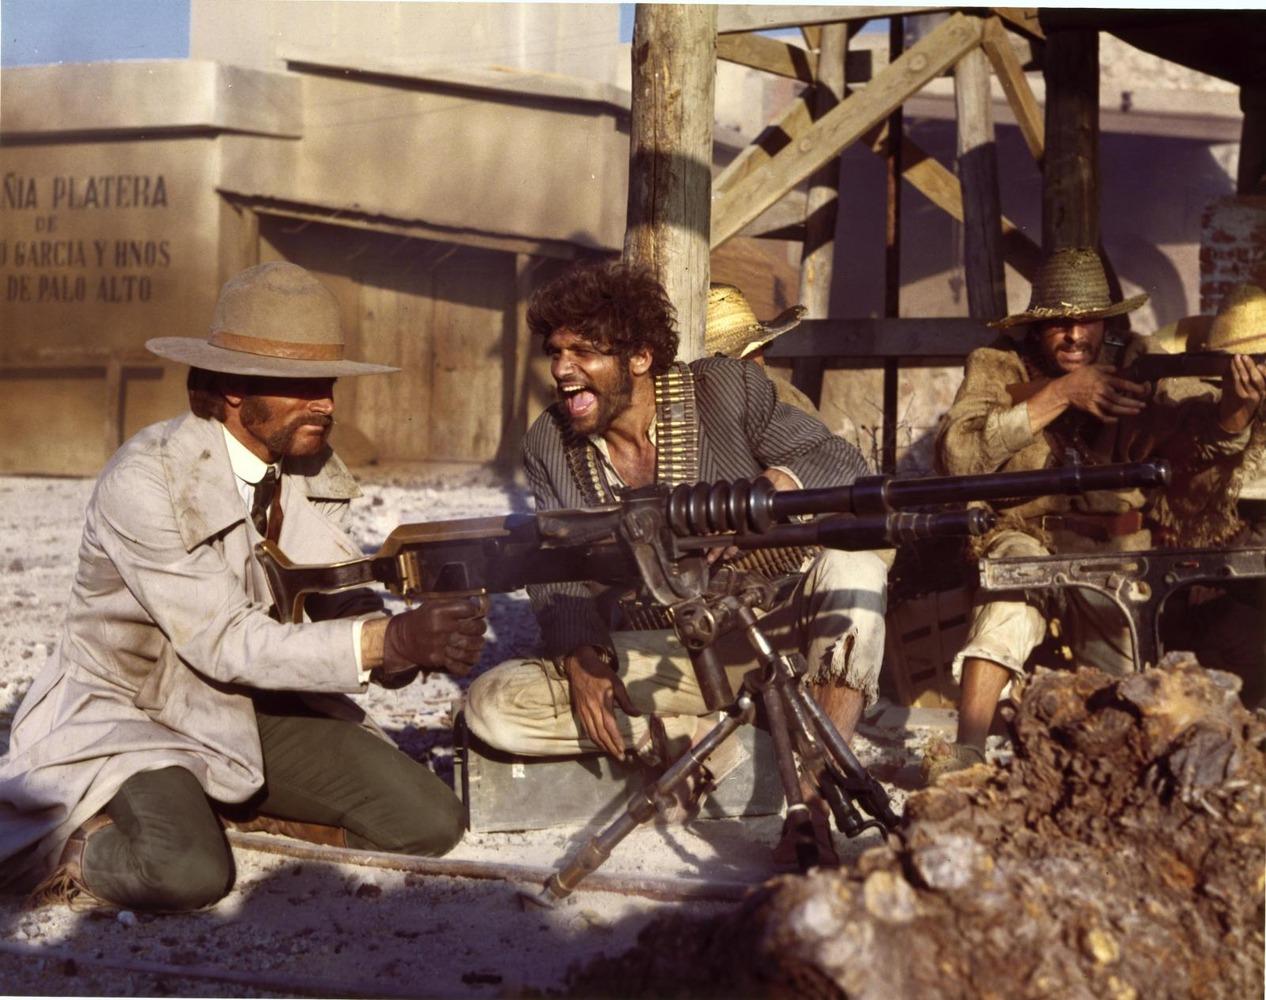 el-mercenario-il-mercenario-15-10-1969-29-08-1968-6-g.jpg